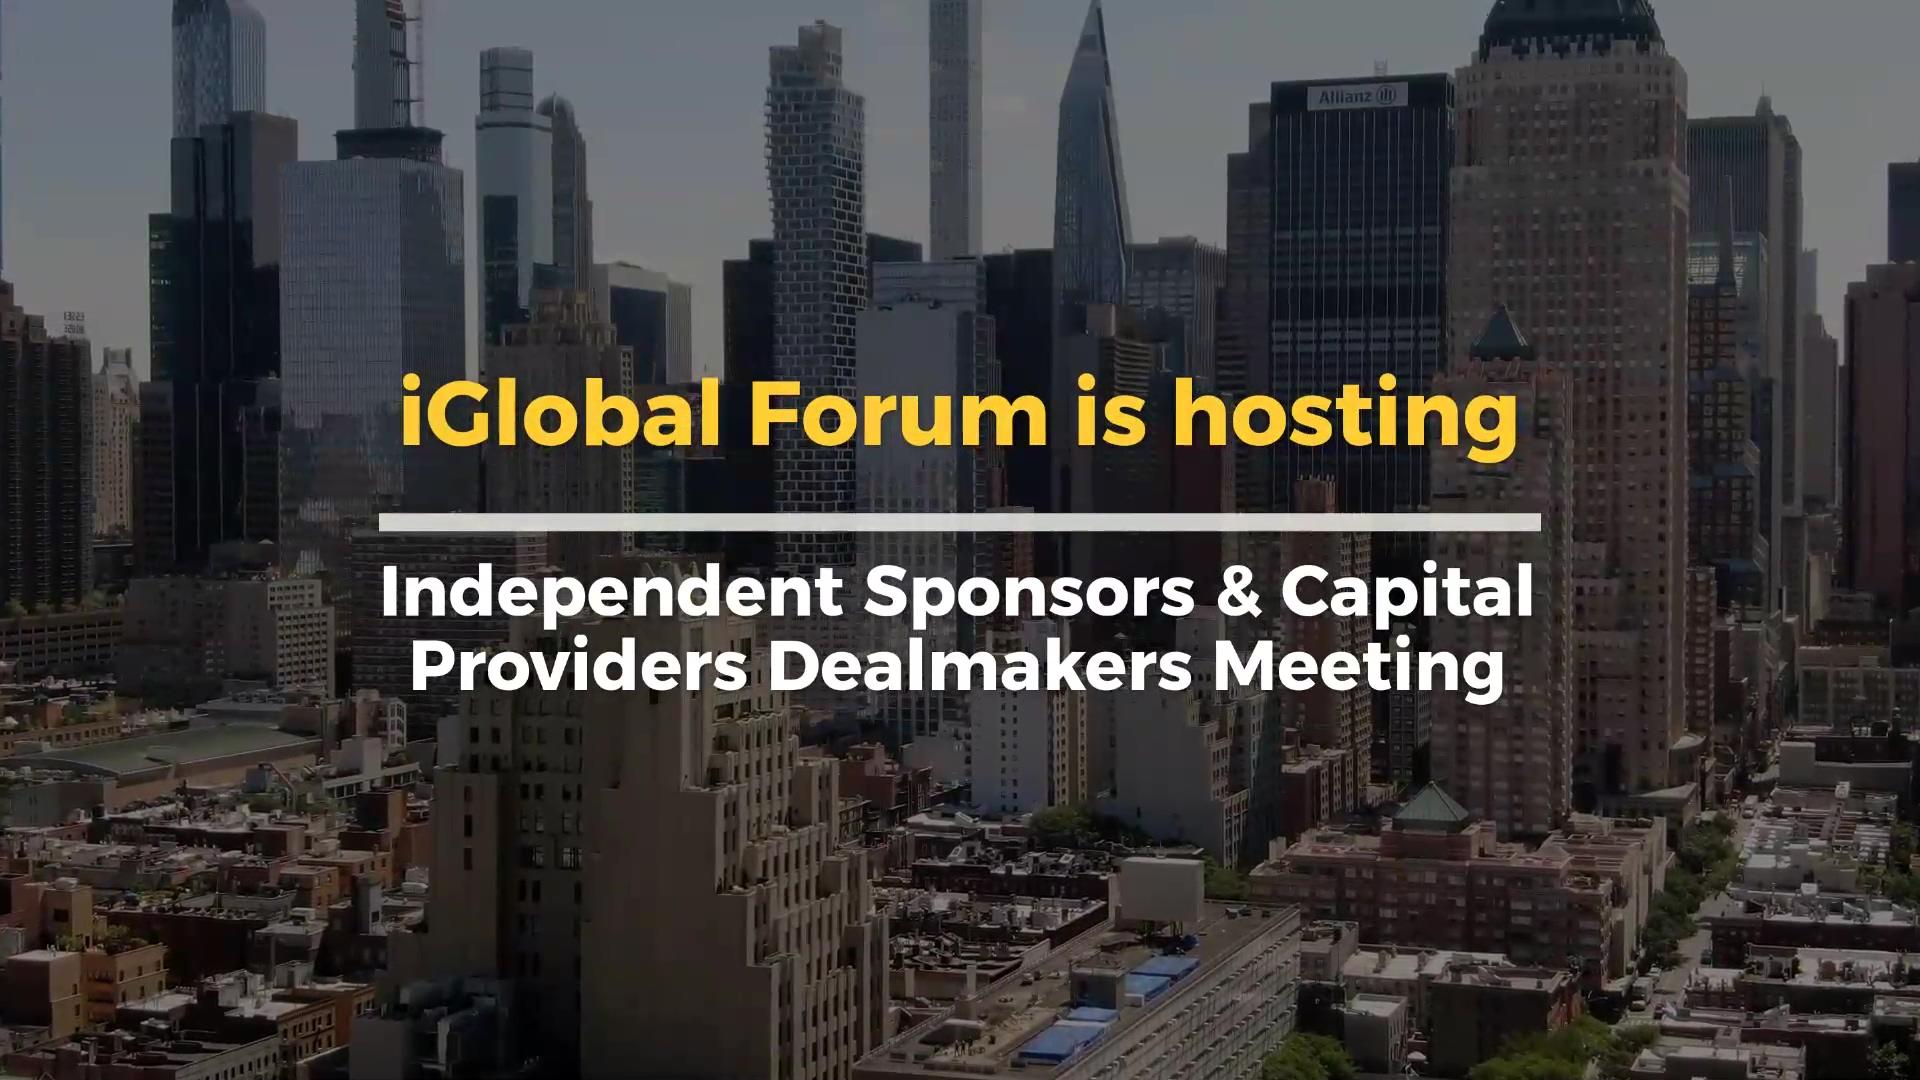 iGlobal_Forum_is_hos